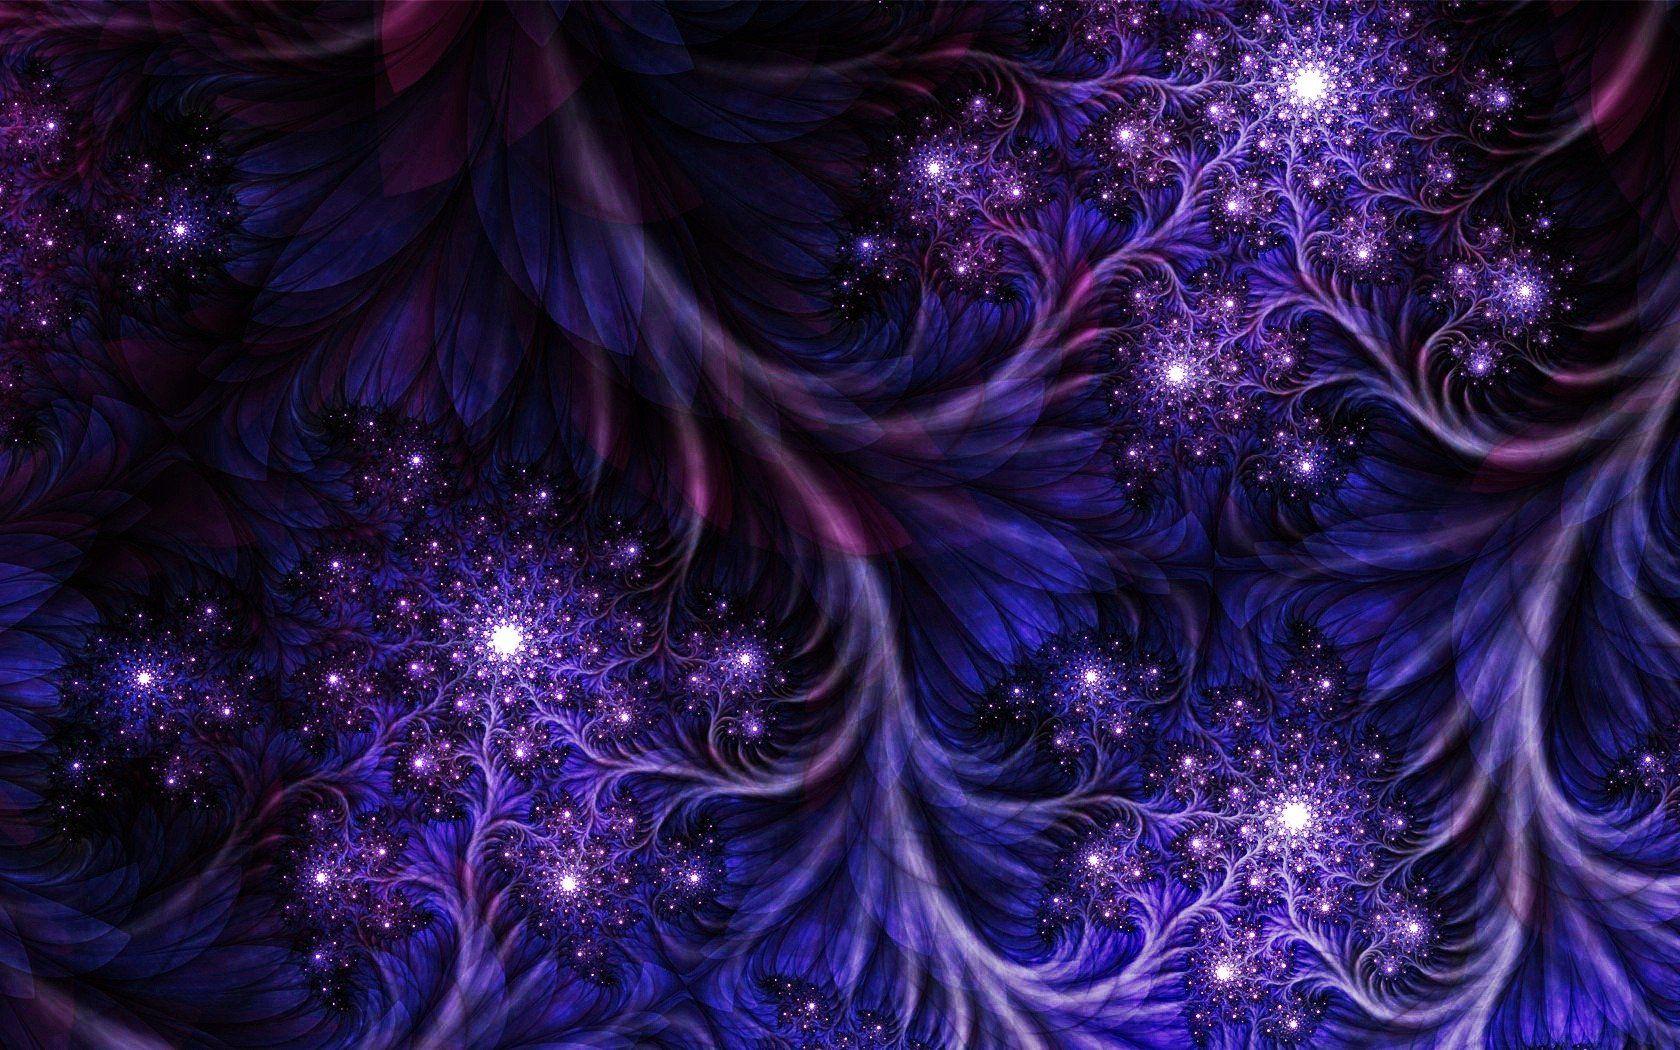 Abstract Dark Purple Fractal Wallpaper 1680x1050 290652 Fractals Purple Wallpaper Fractal Patterns